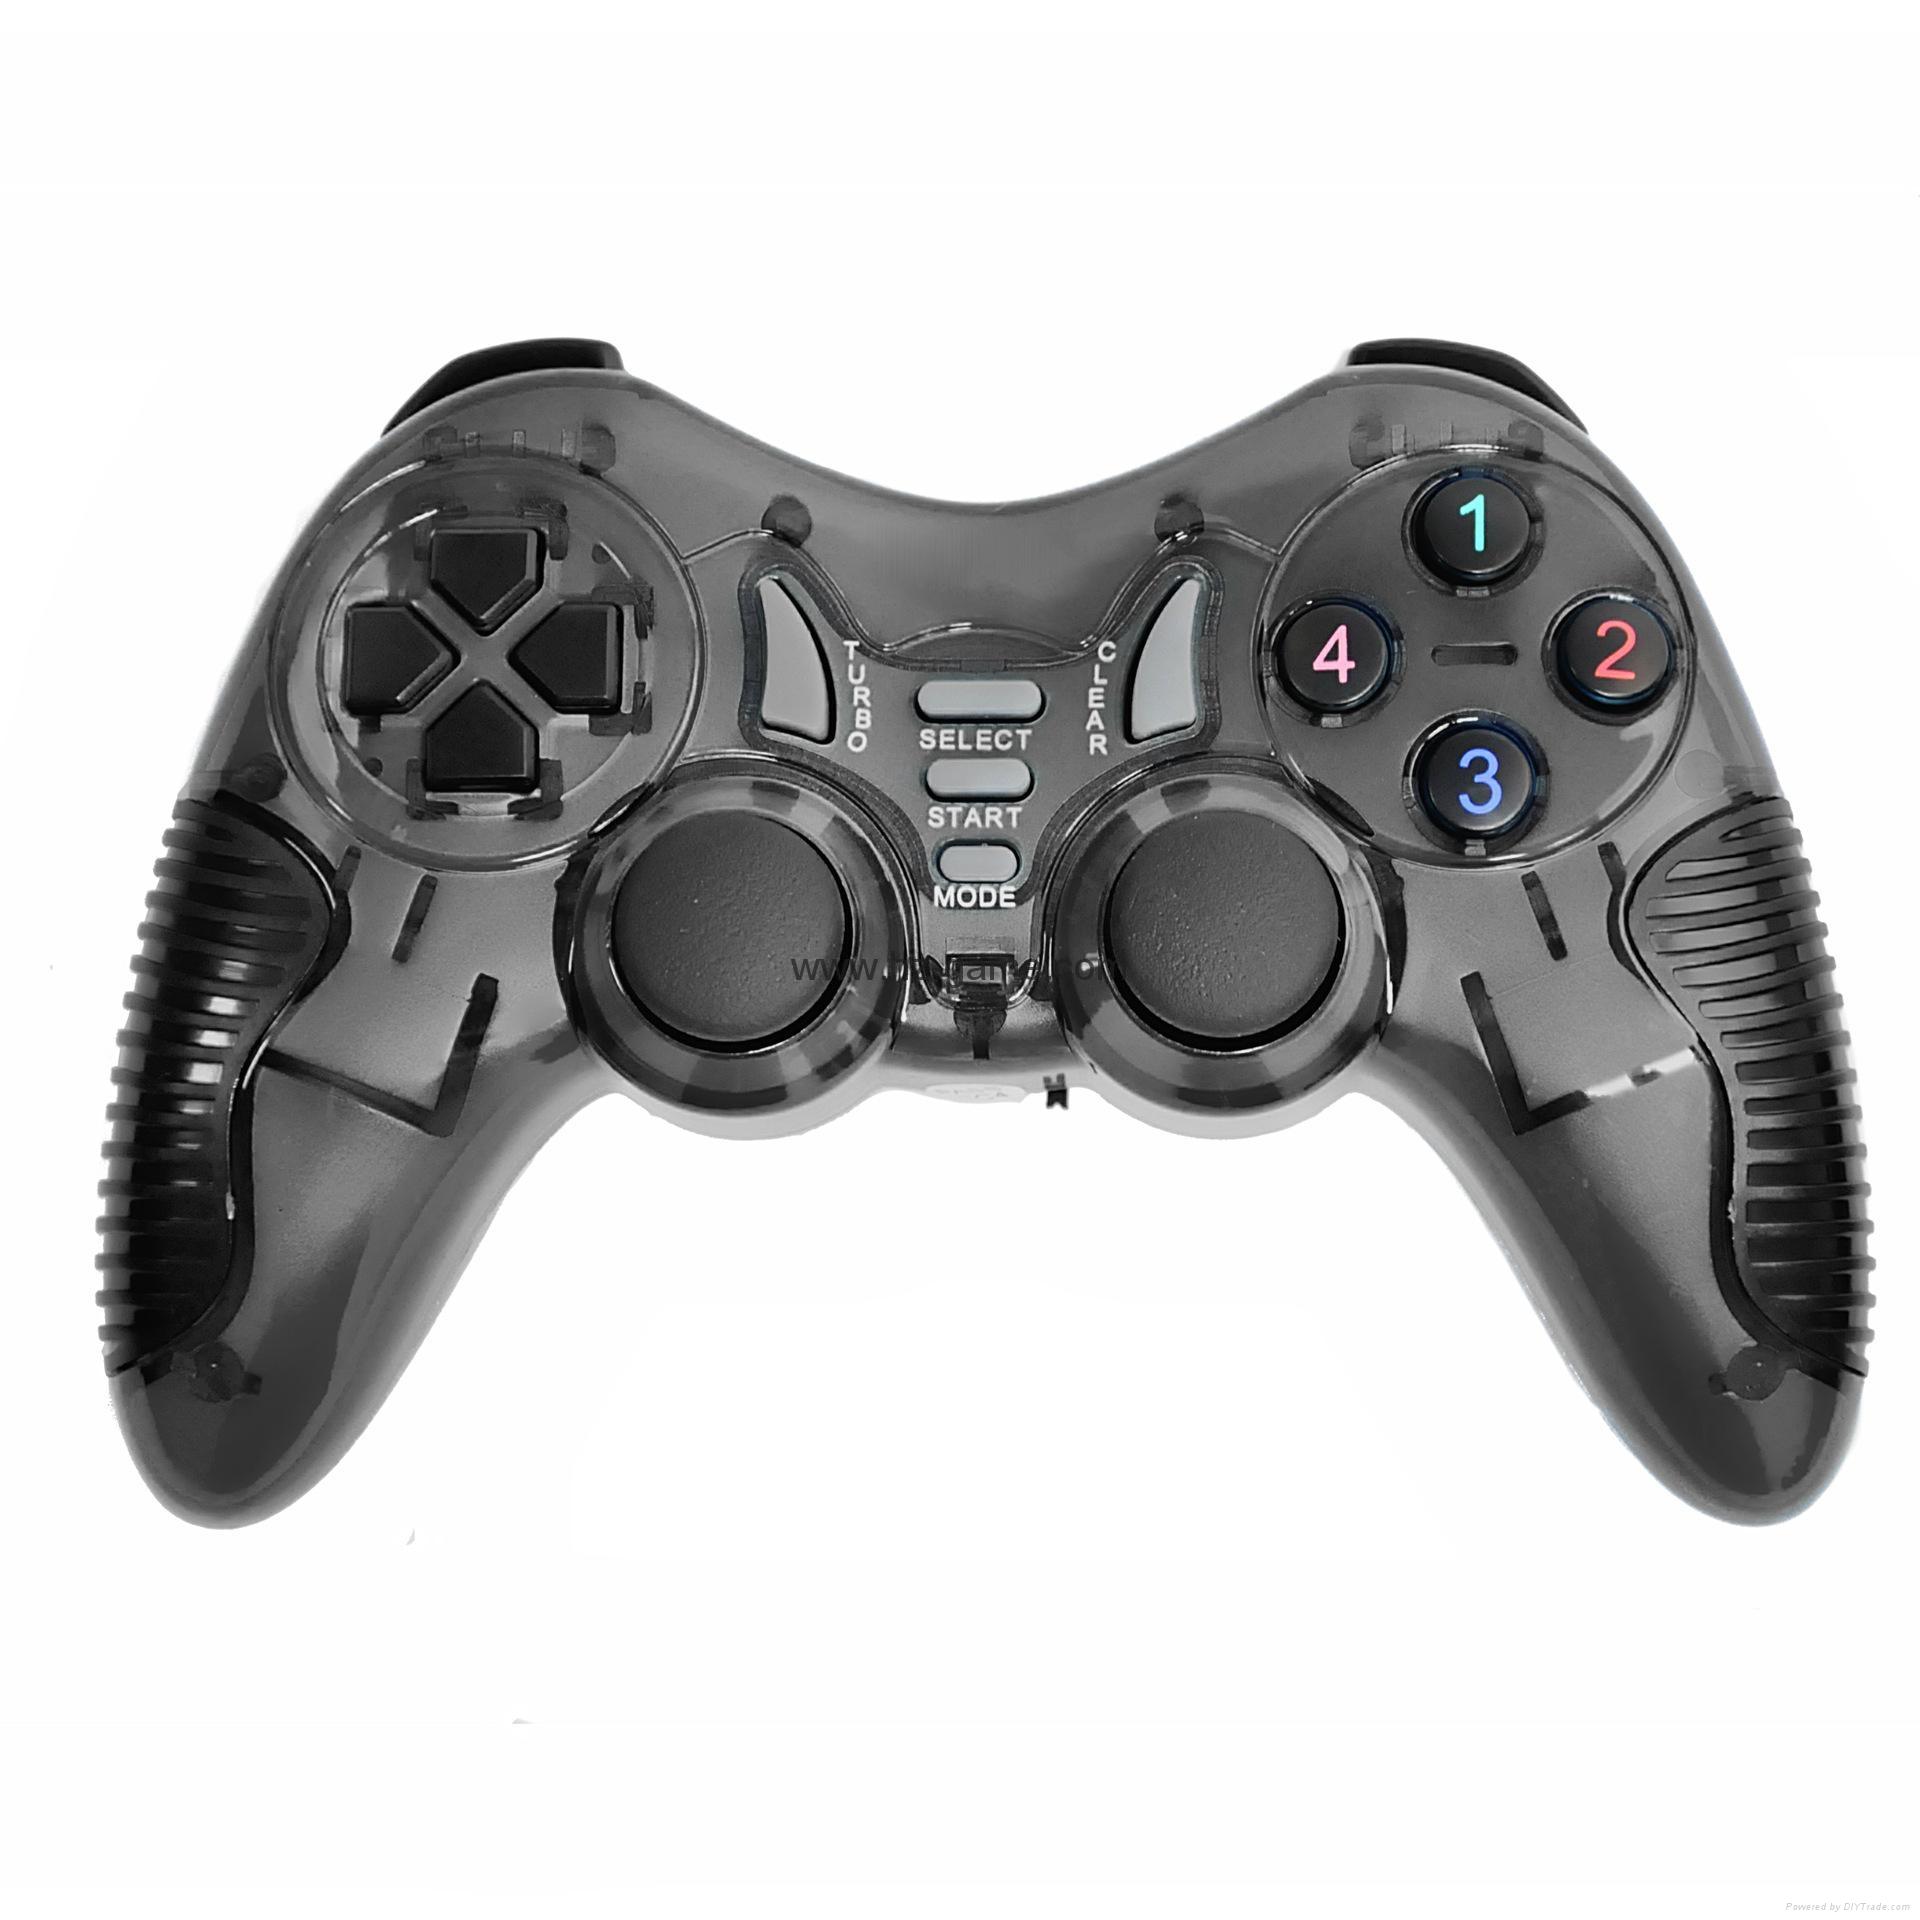 PS2有线震动手柄pc usb电脑 双马达震动 PS2单震动游戏手柄 11